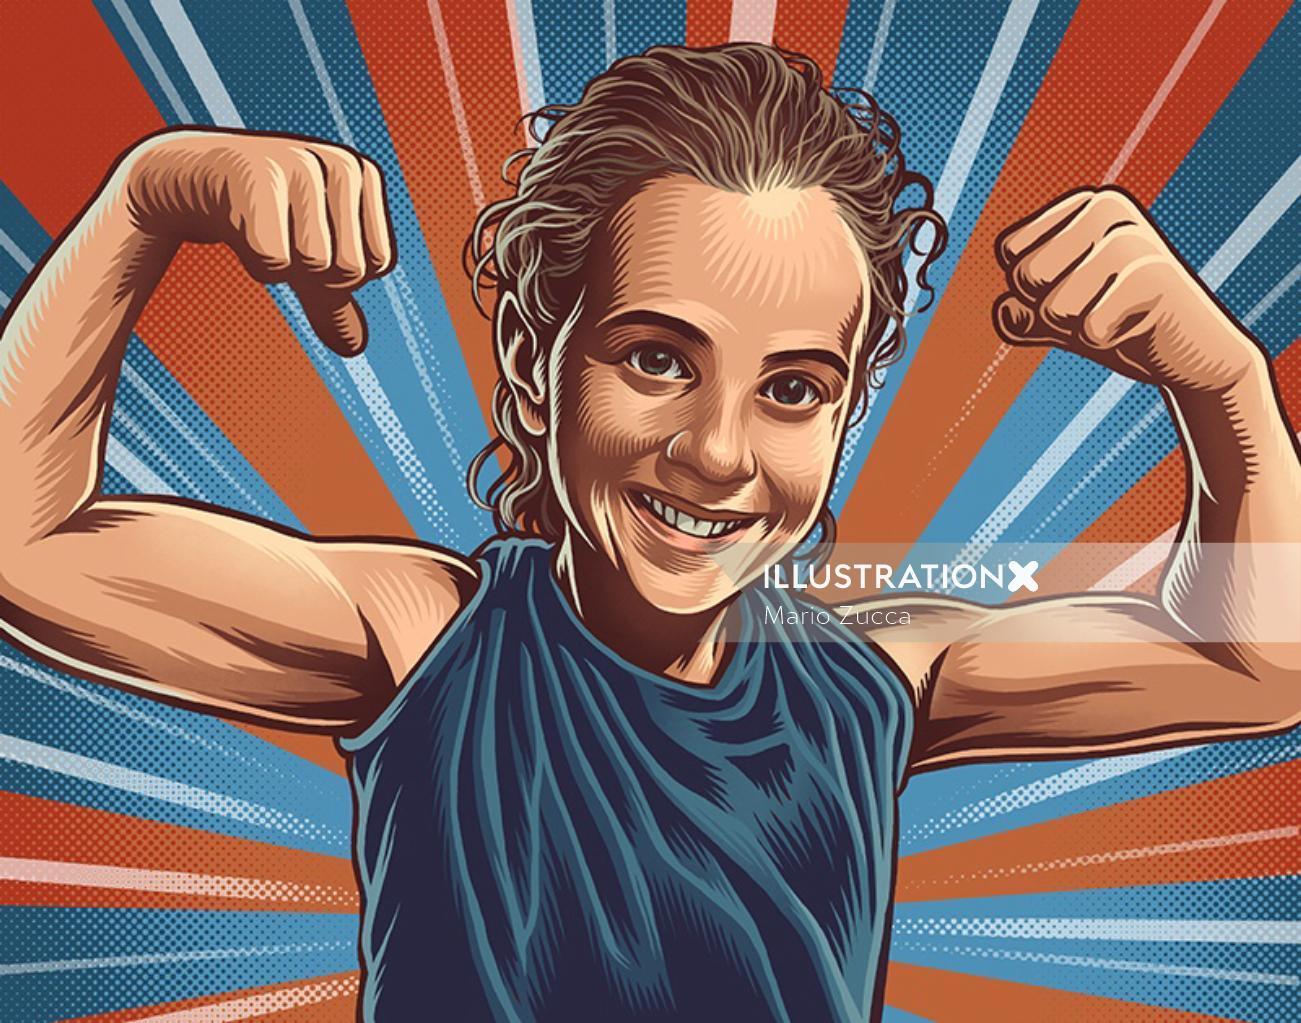 Women body builder portrait illustration